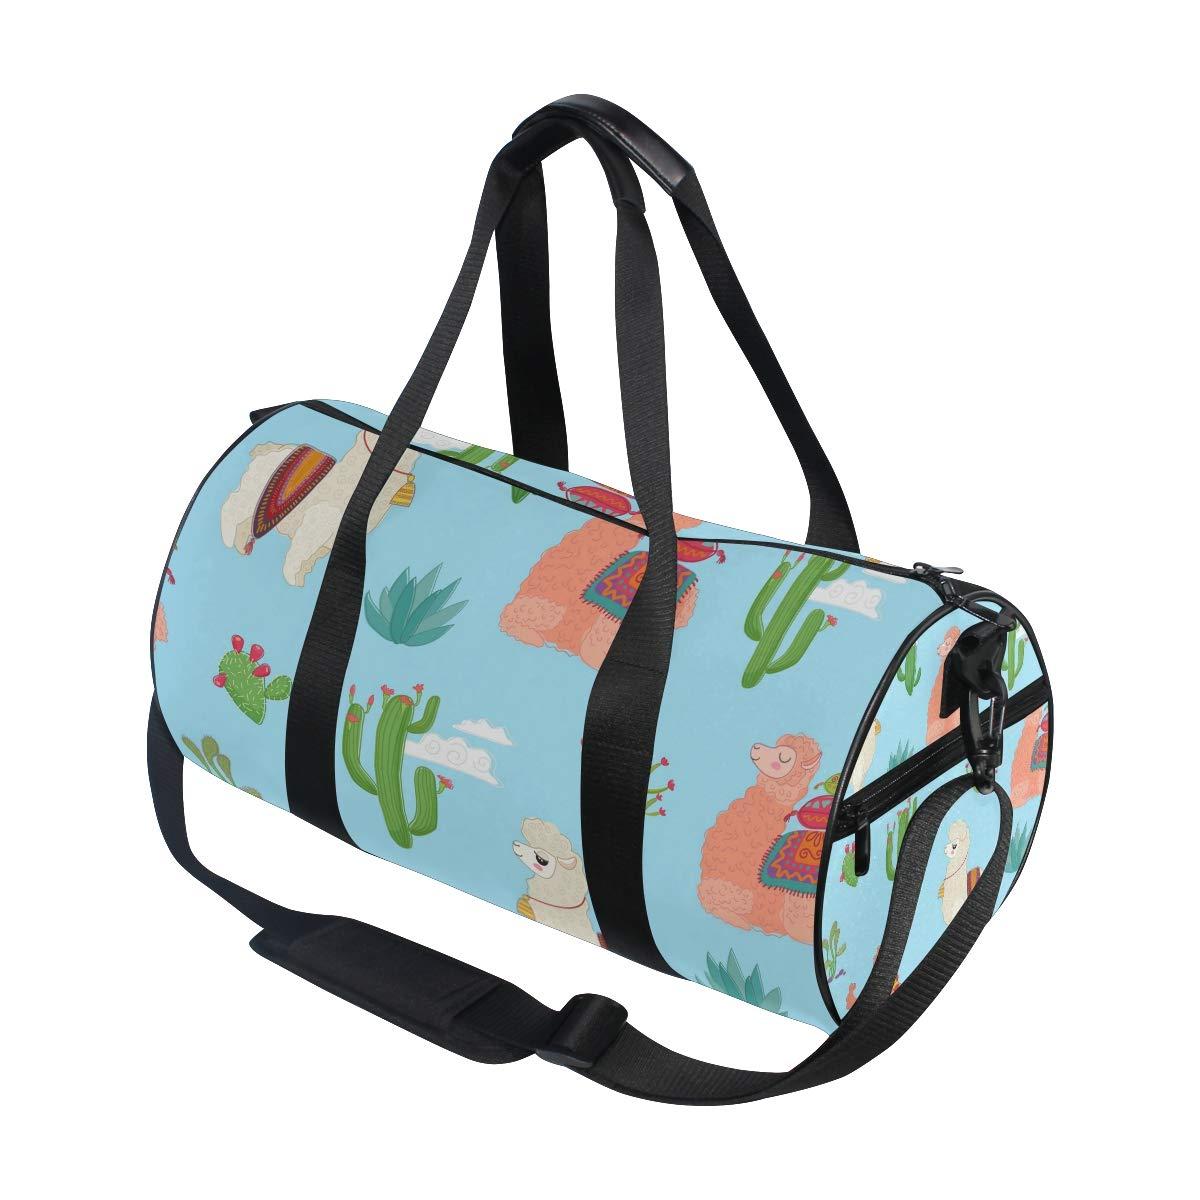 Llama Unisex's Duffel Bag Travel Tote Luggage Bag Gym Sports Luggage Bag by EVERUI (Image #3)